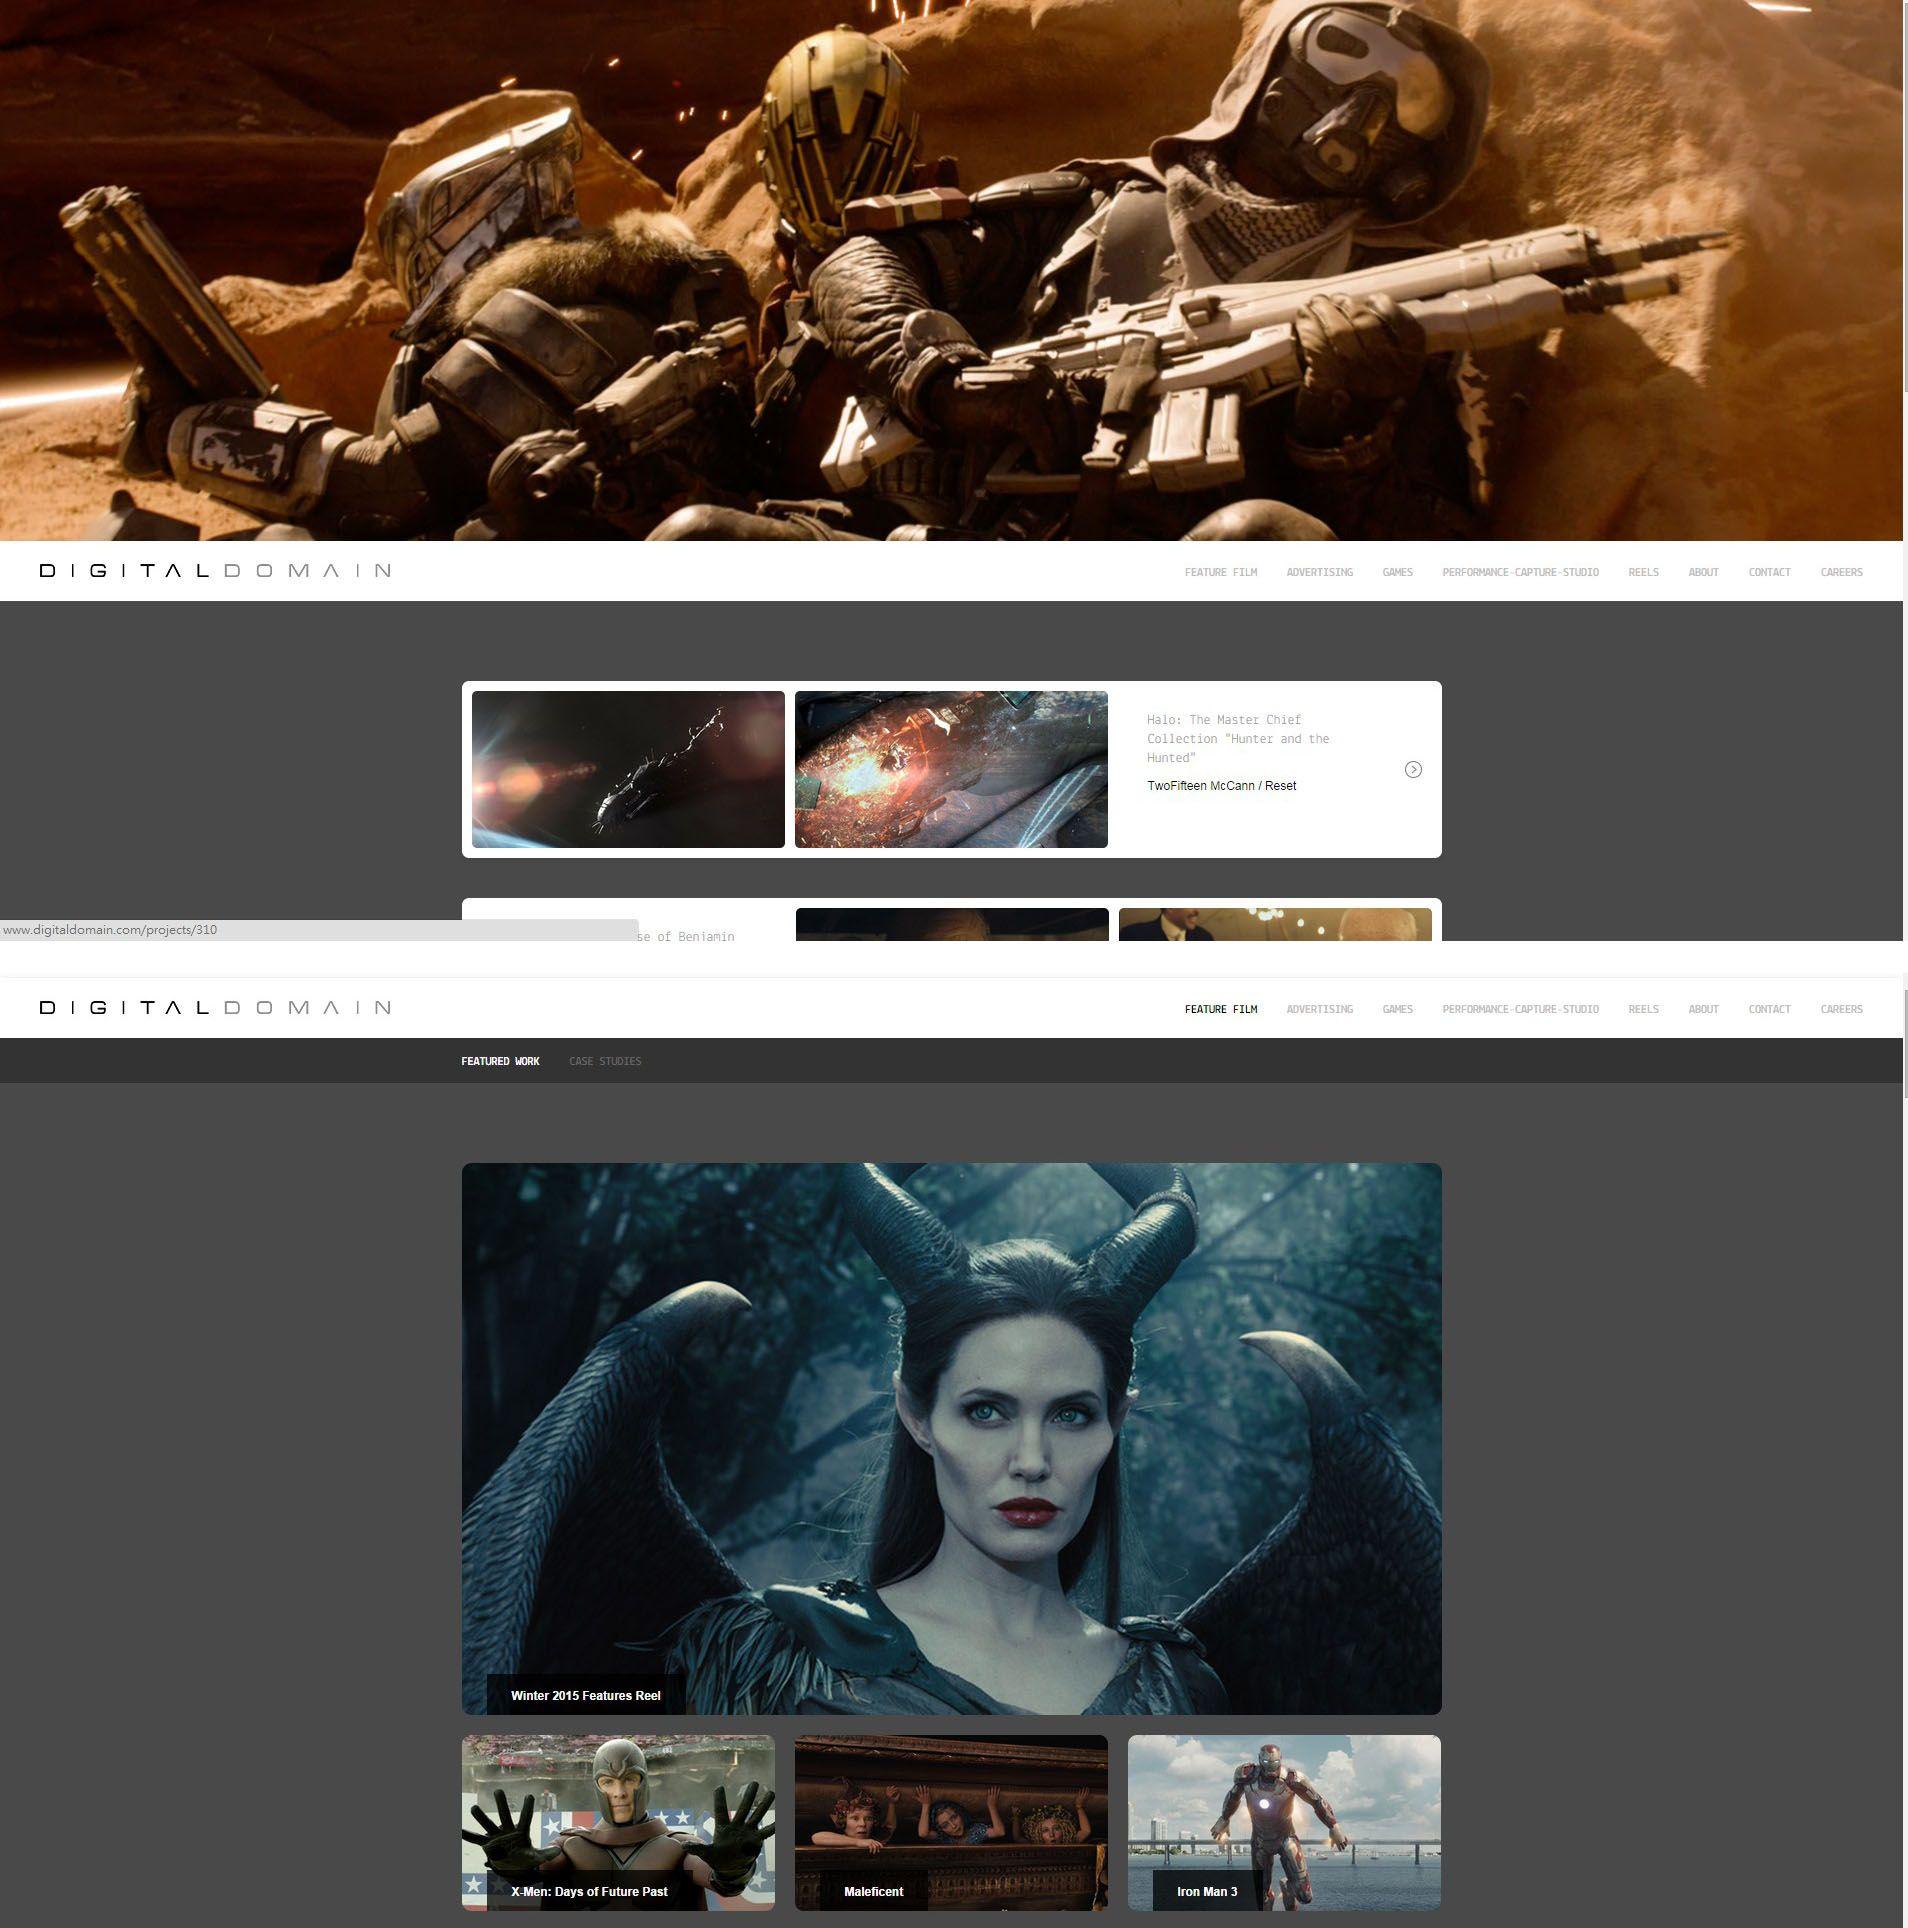 http://www.digitaldomain.com/